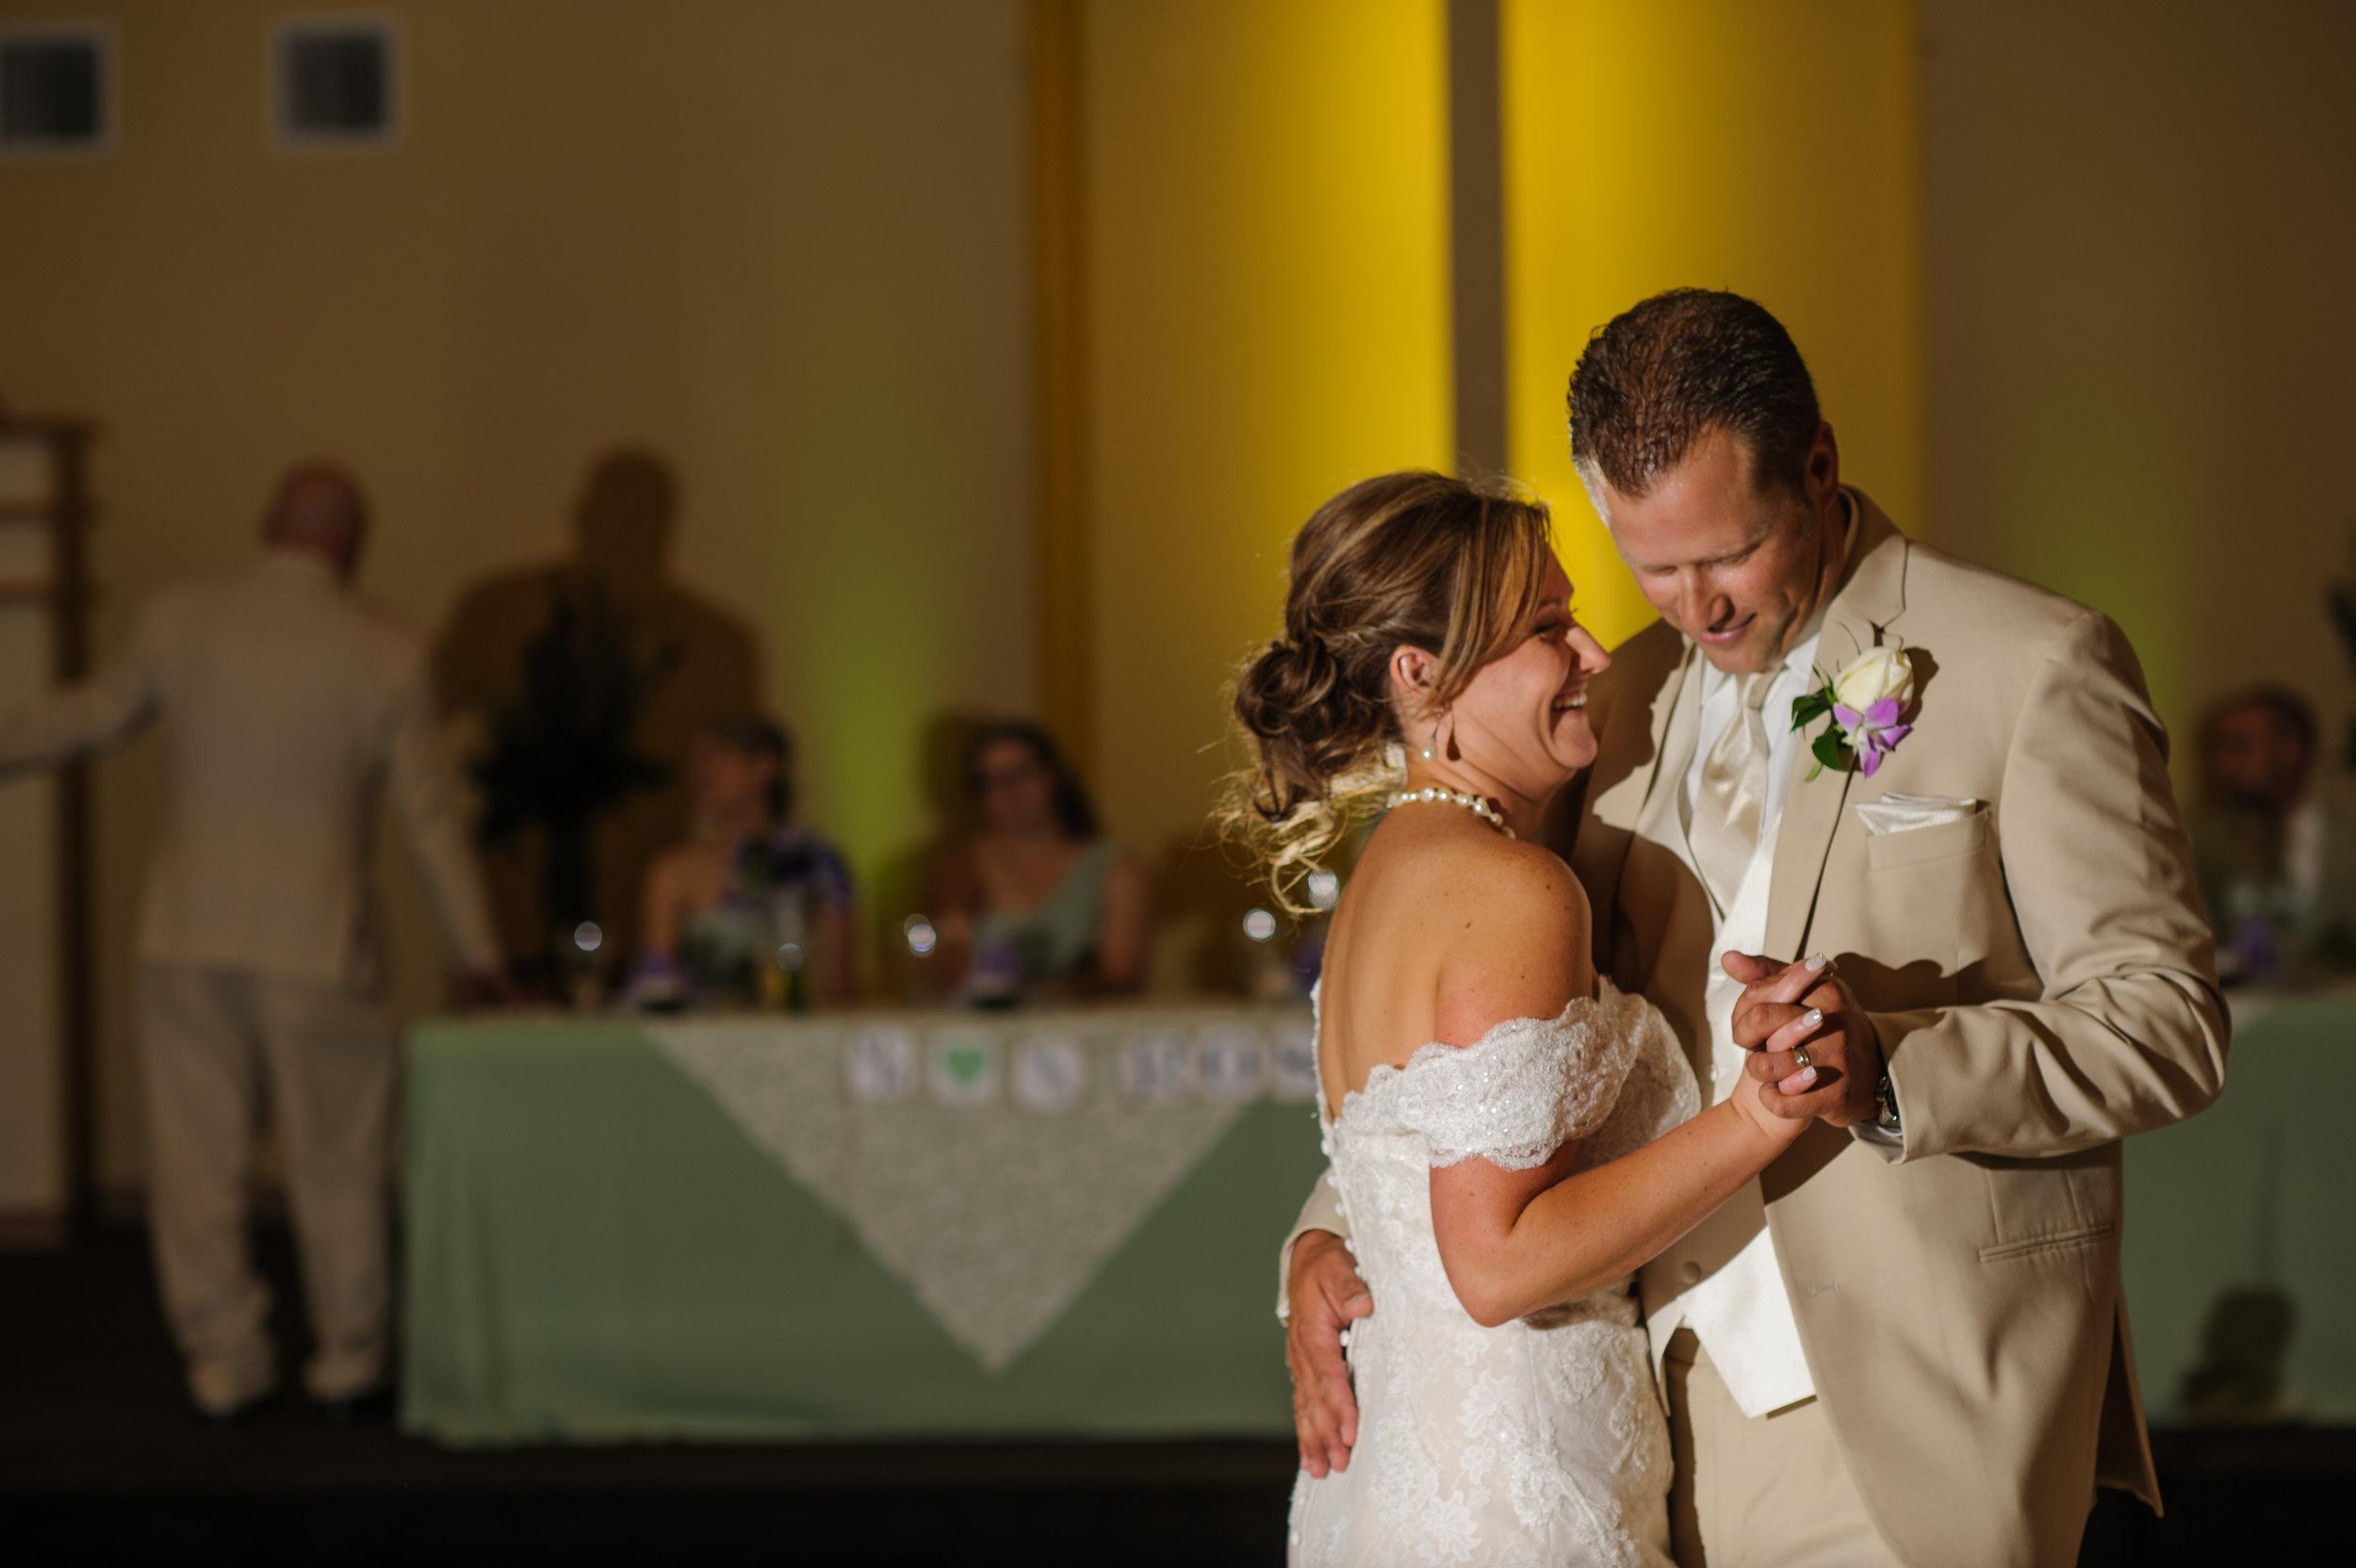 danielle-ross-020-sacramento-wedding-photographer-katherine-nicole-photography.JPG